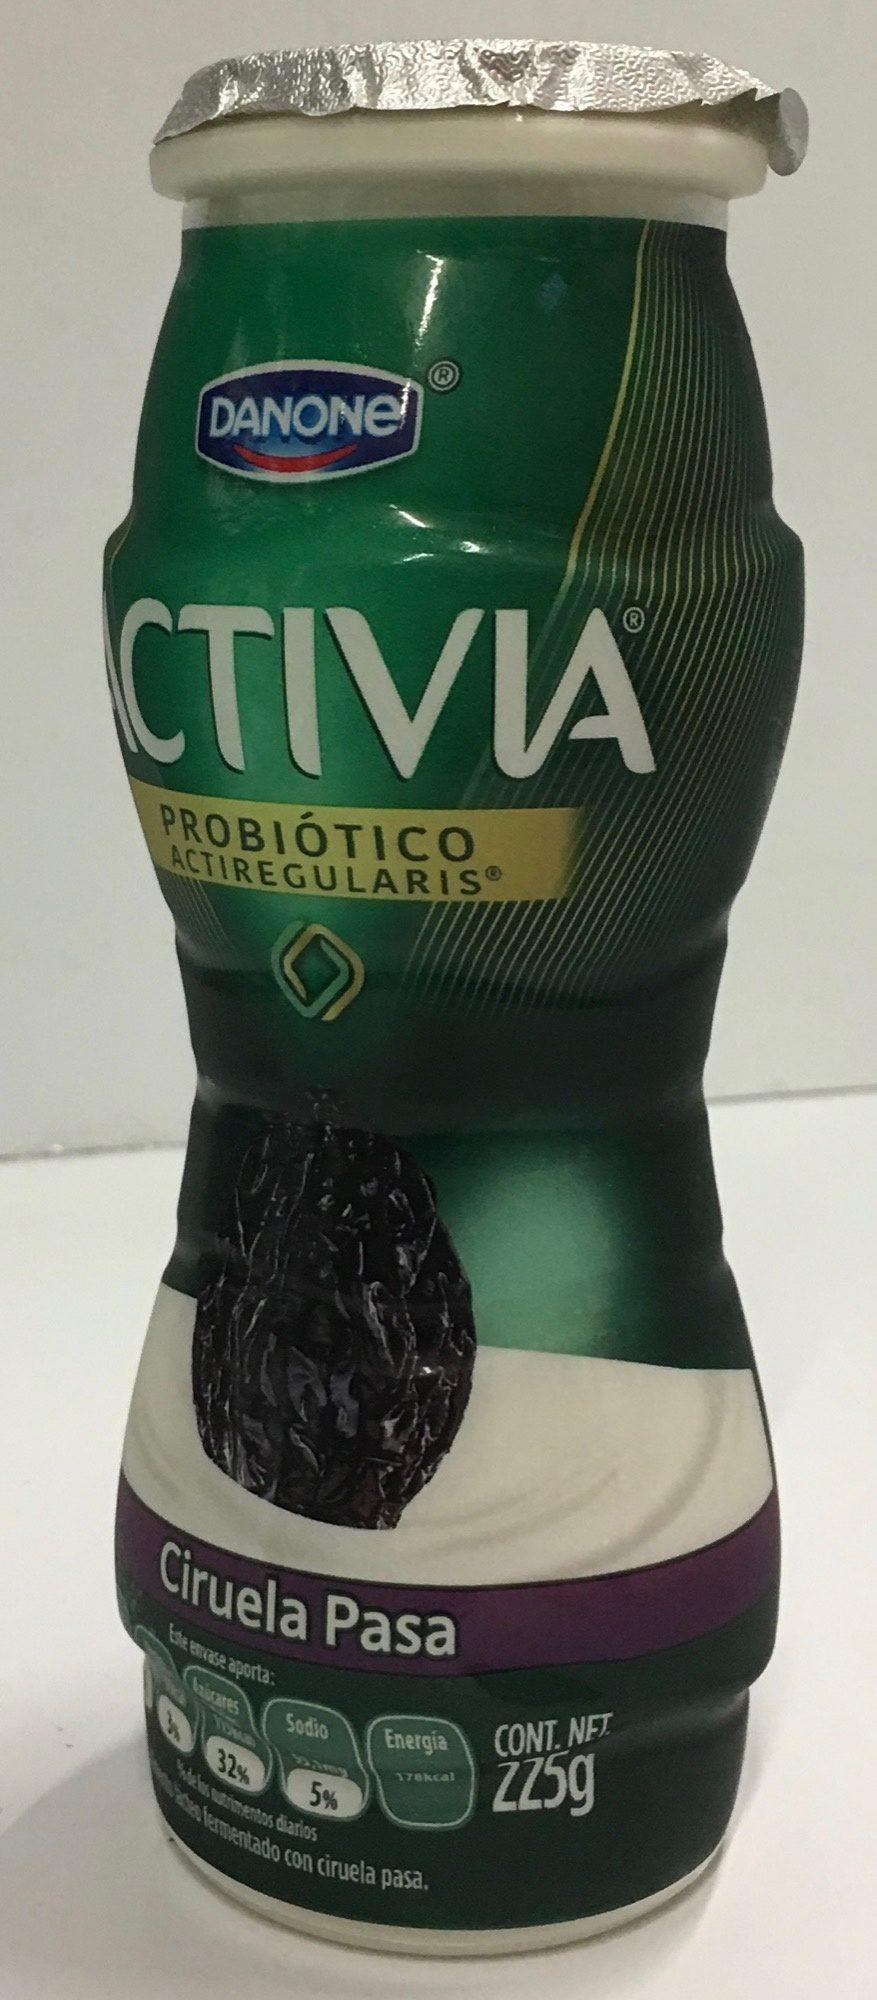 Activia Ciruela Pasa Danone - Product